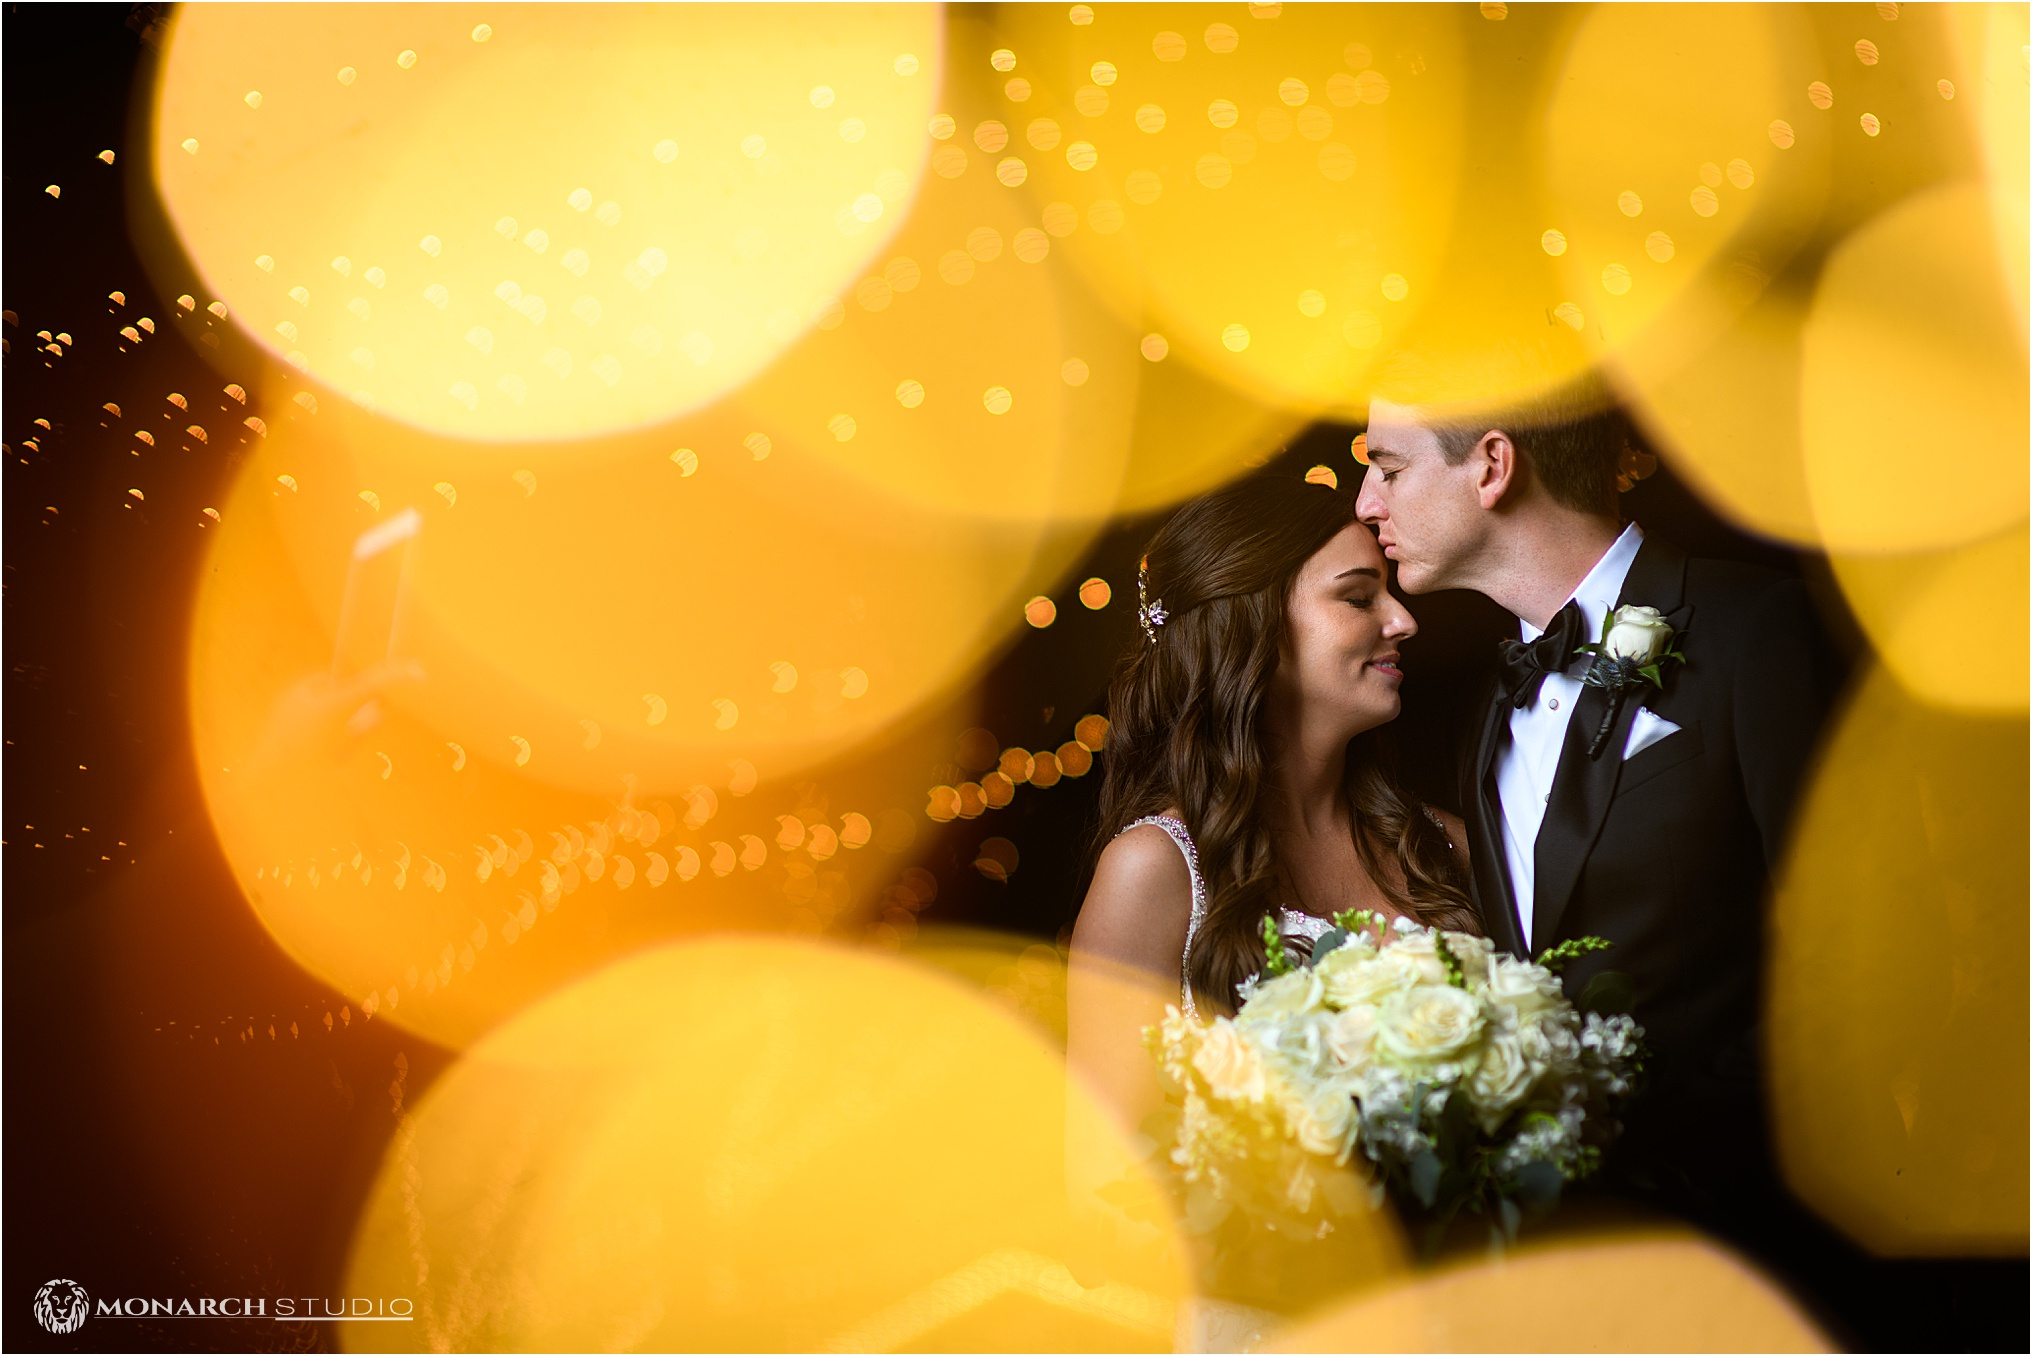 saint-augustine-wedding-photographer-treasury-078.jpg